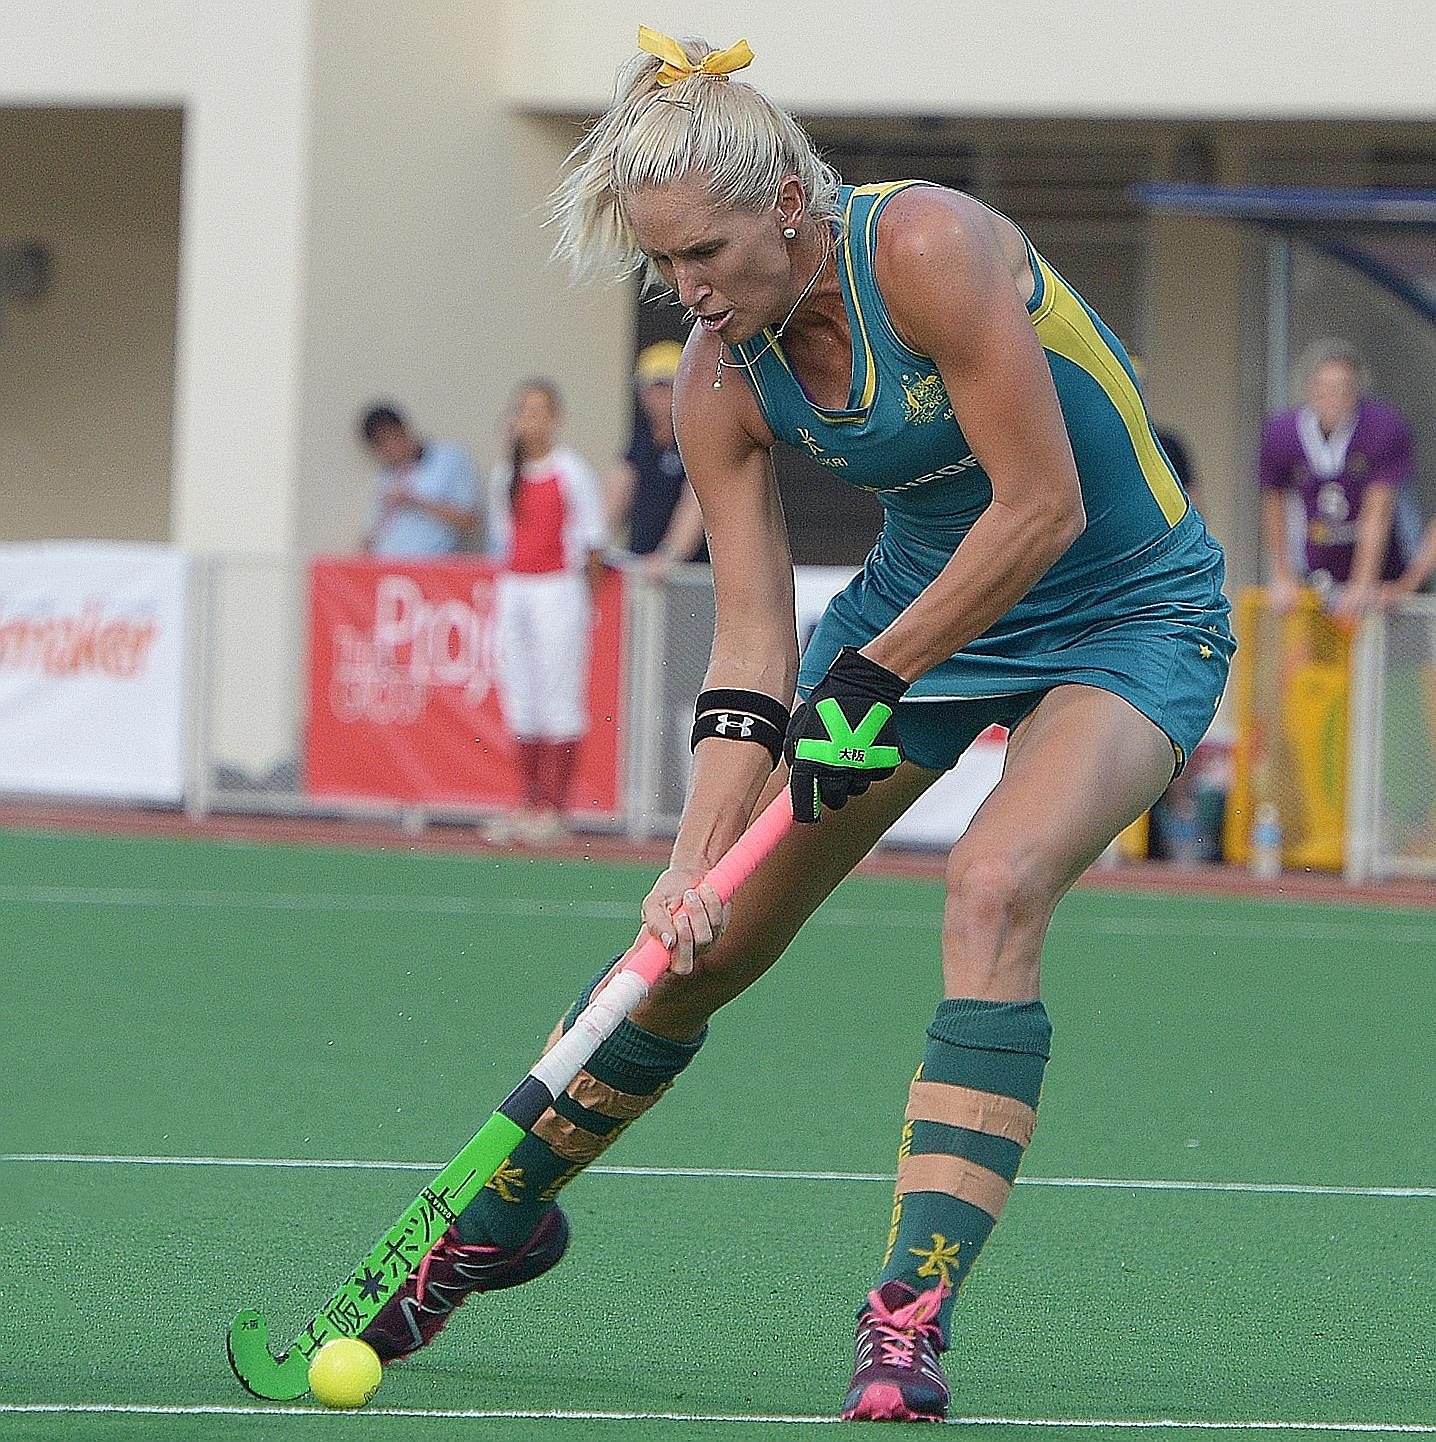 Australia's Jodie Kenny in action during last week's TPG International Tri-Series women's hockey tournament.